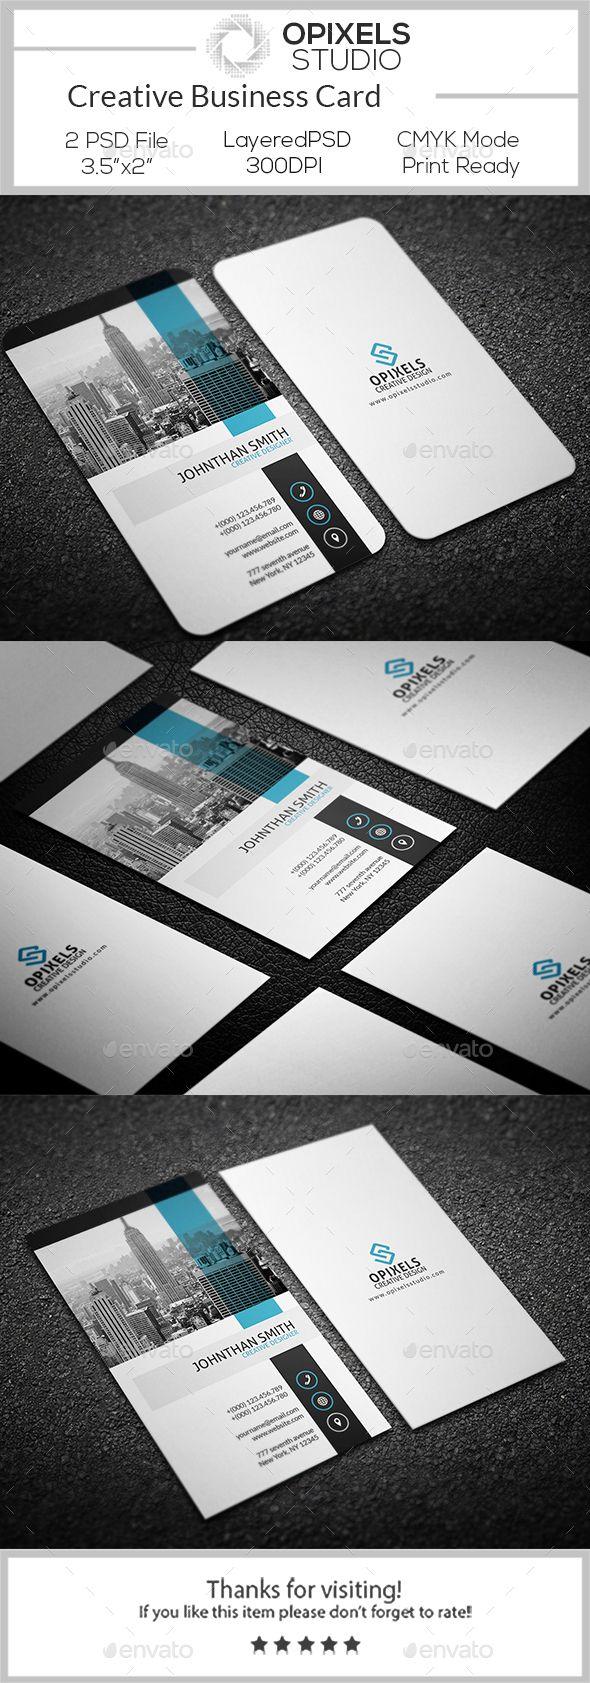 Creative Business Card Template PSD